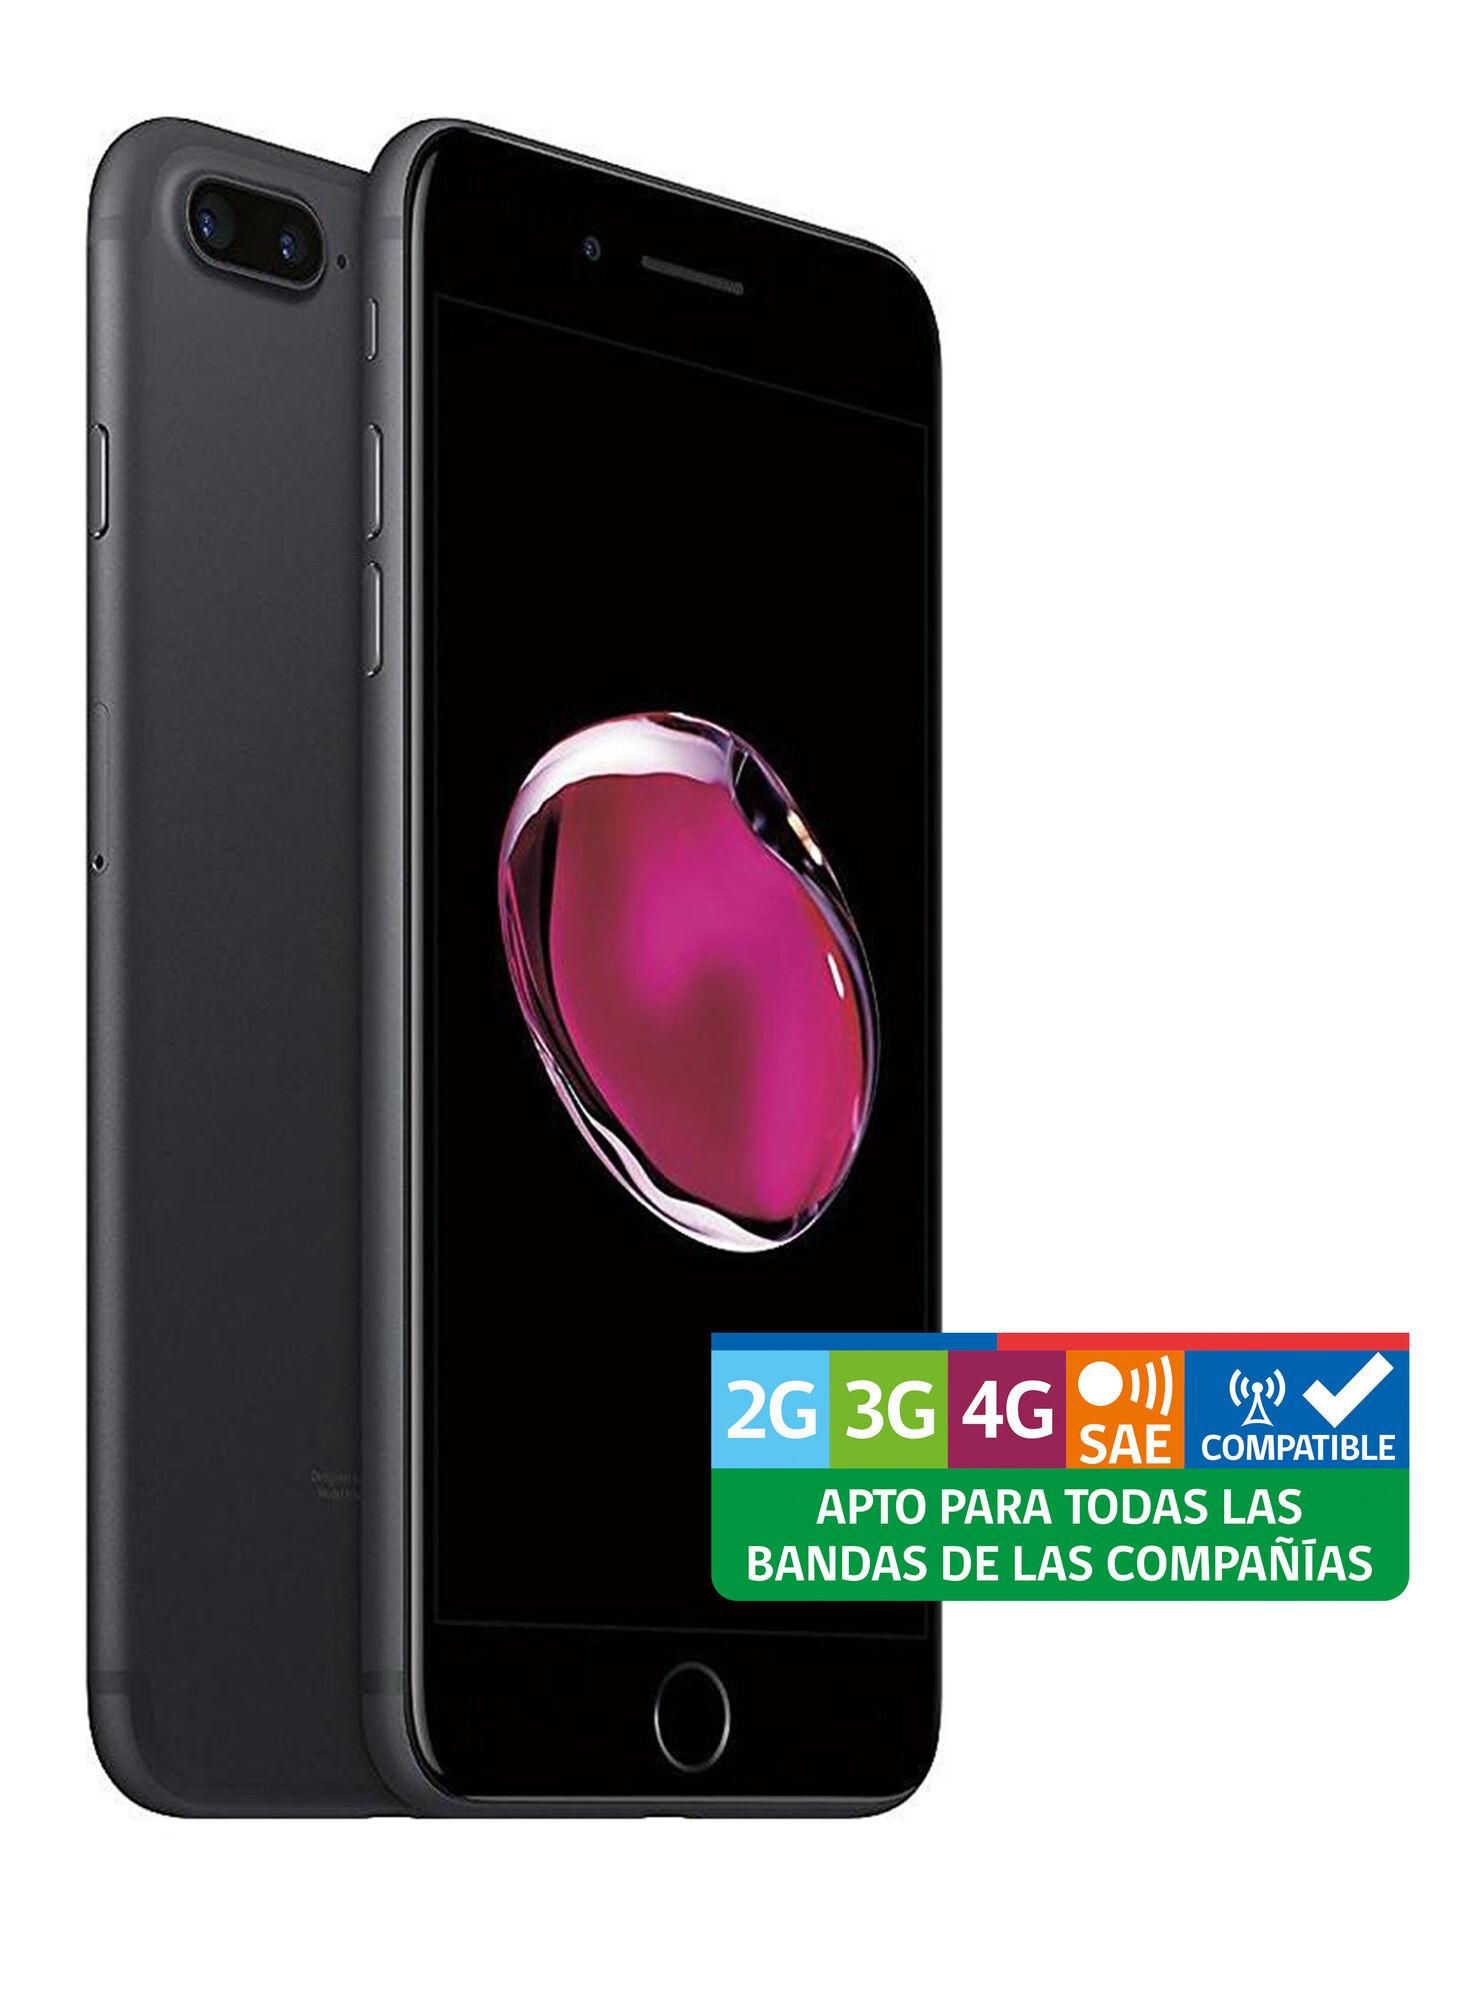 13206a57a46 Iphone 7 Plus 128GB Negro Brillante Liberado en Celulares | Paris